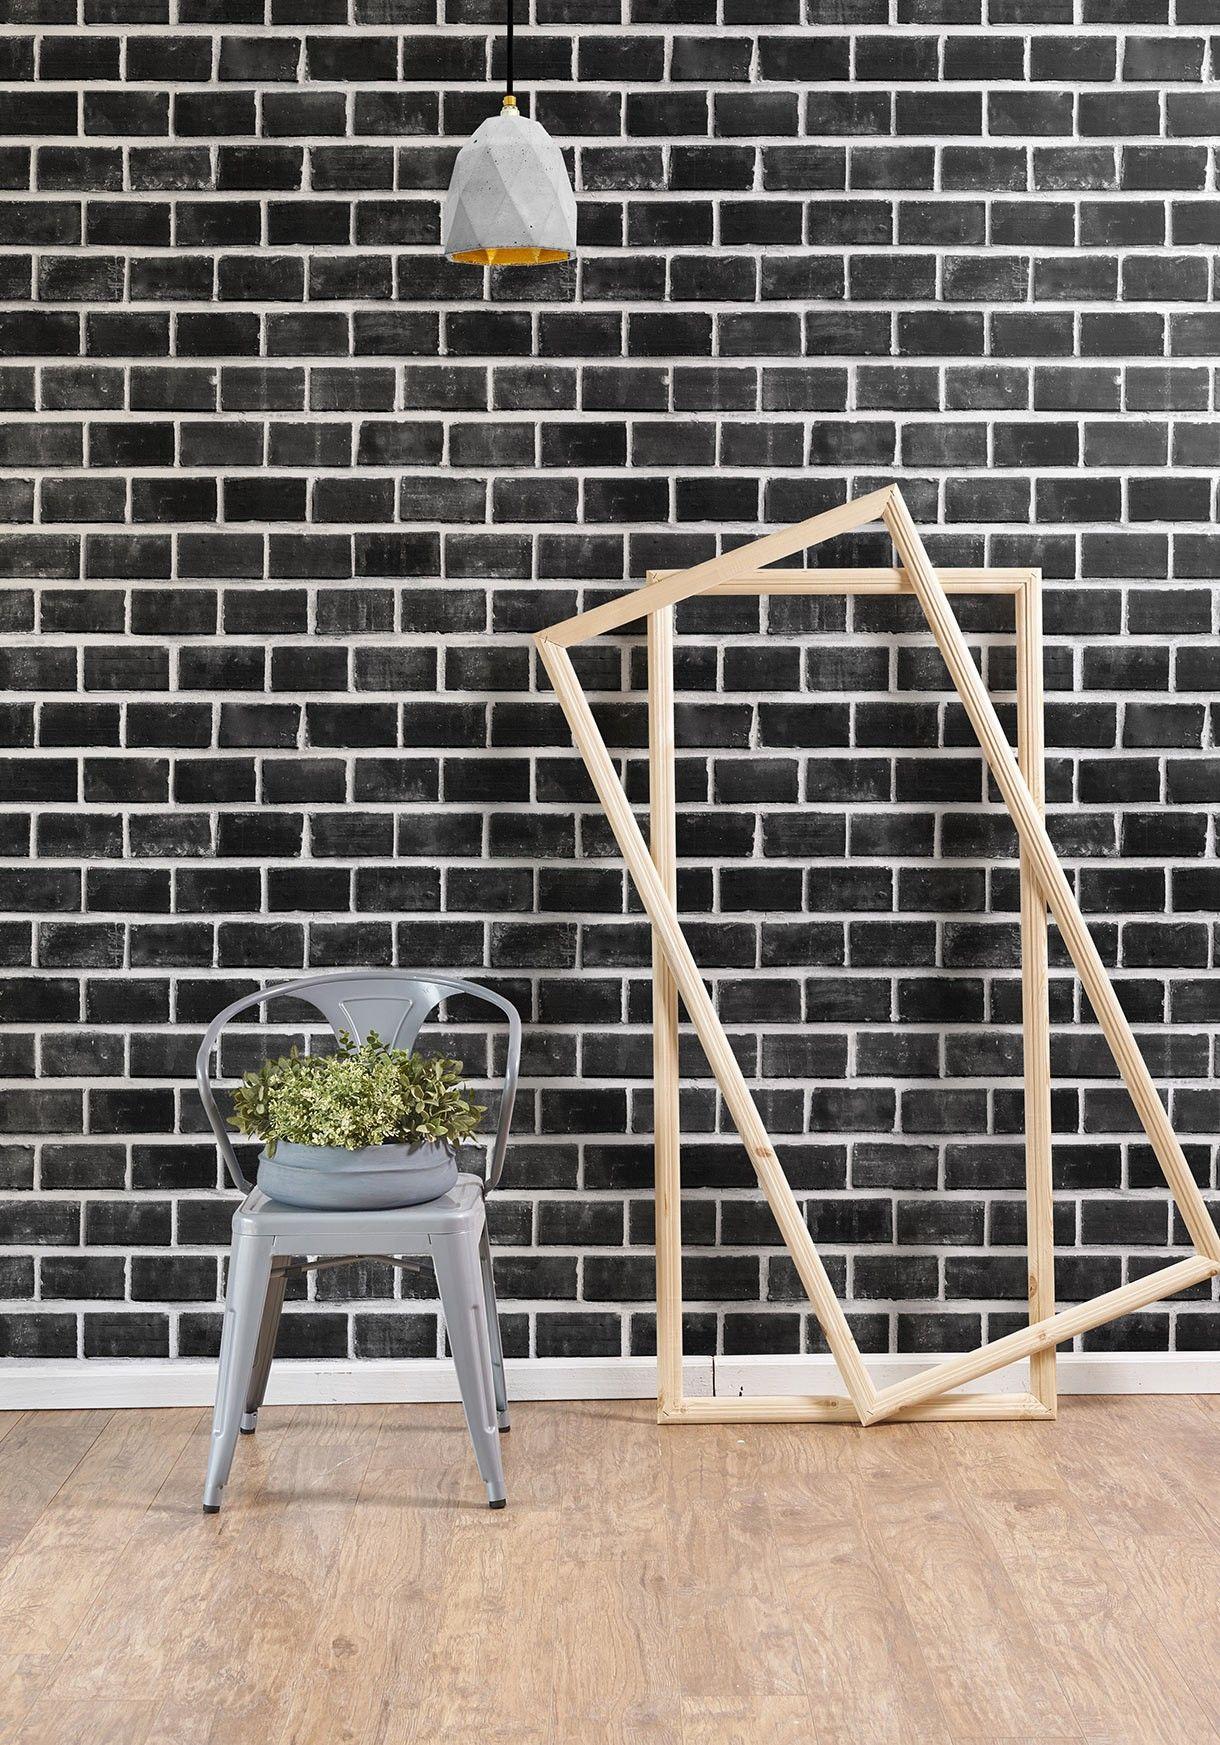 Lubeck Bricks Wallpaper Exposed Black Bricks Milton King In 2021 Black Brick Wallpaper Exposed Brick Wallpaper White Brick Wallpaper